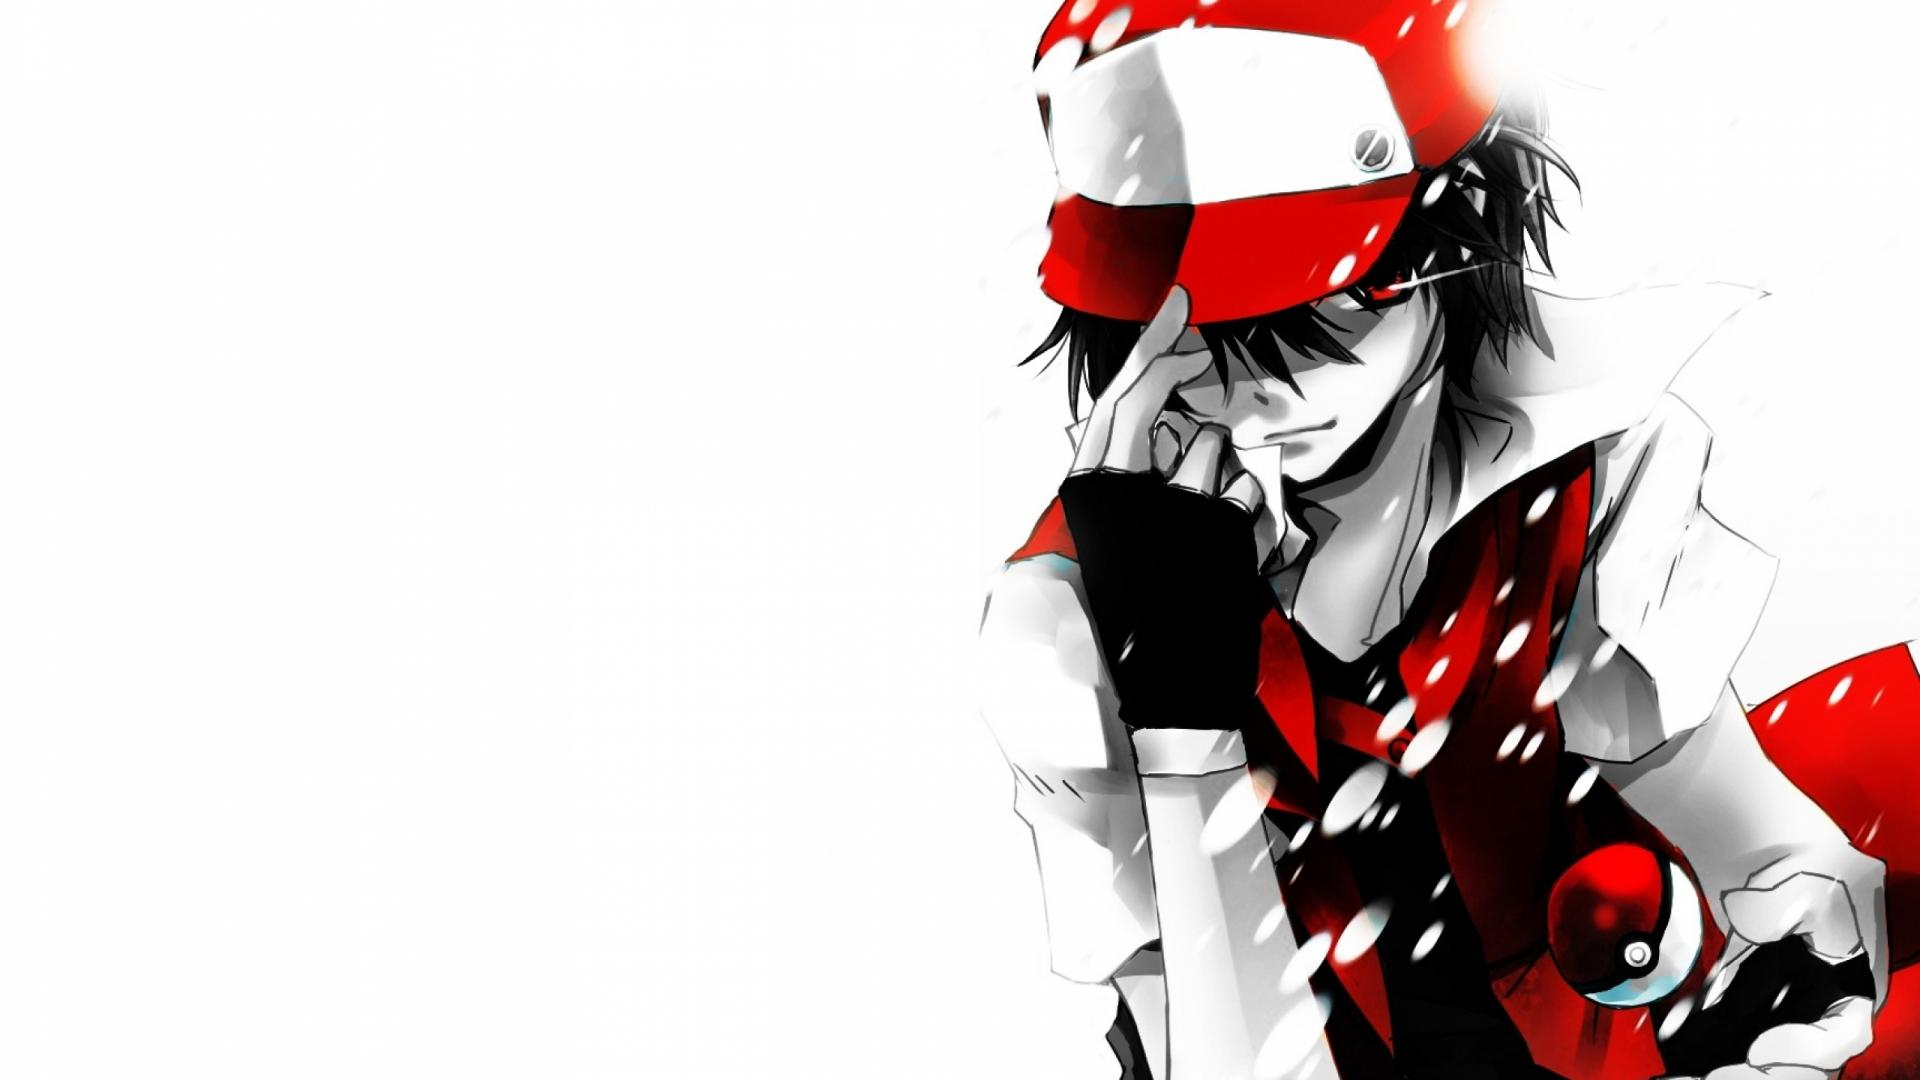 Download Red Pokemon Ash Wallpaper 1920x1080 Full HD Wallpapers 1920x1080